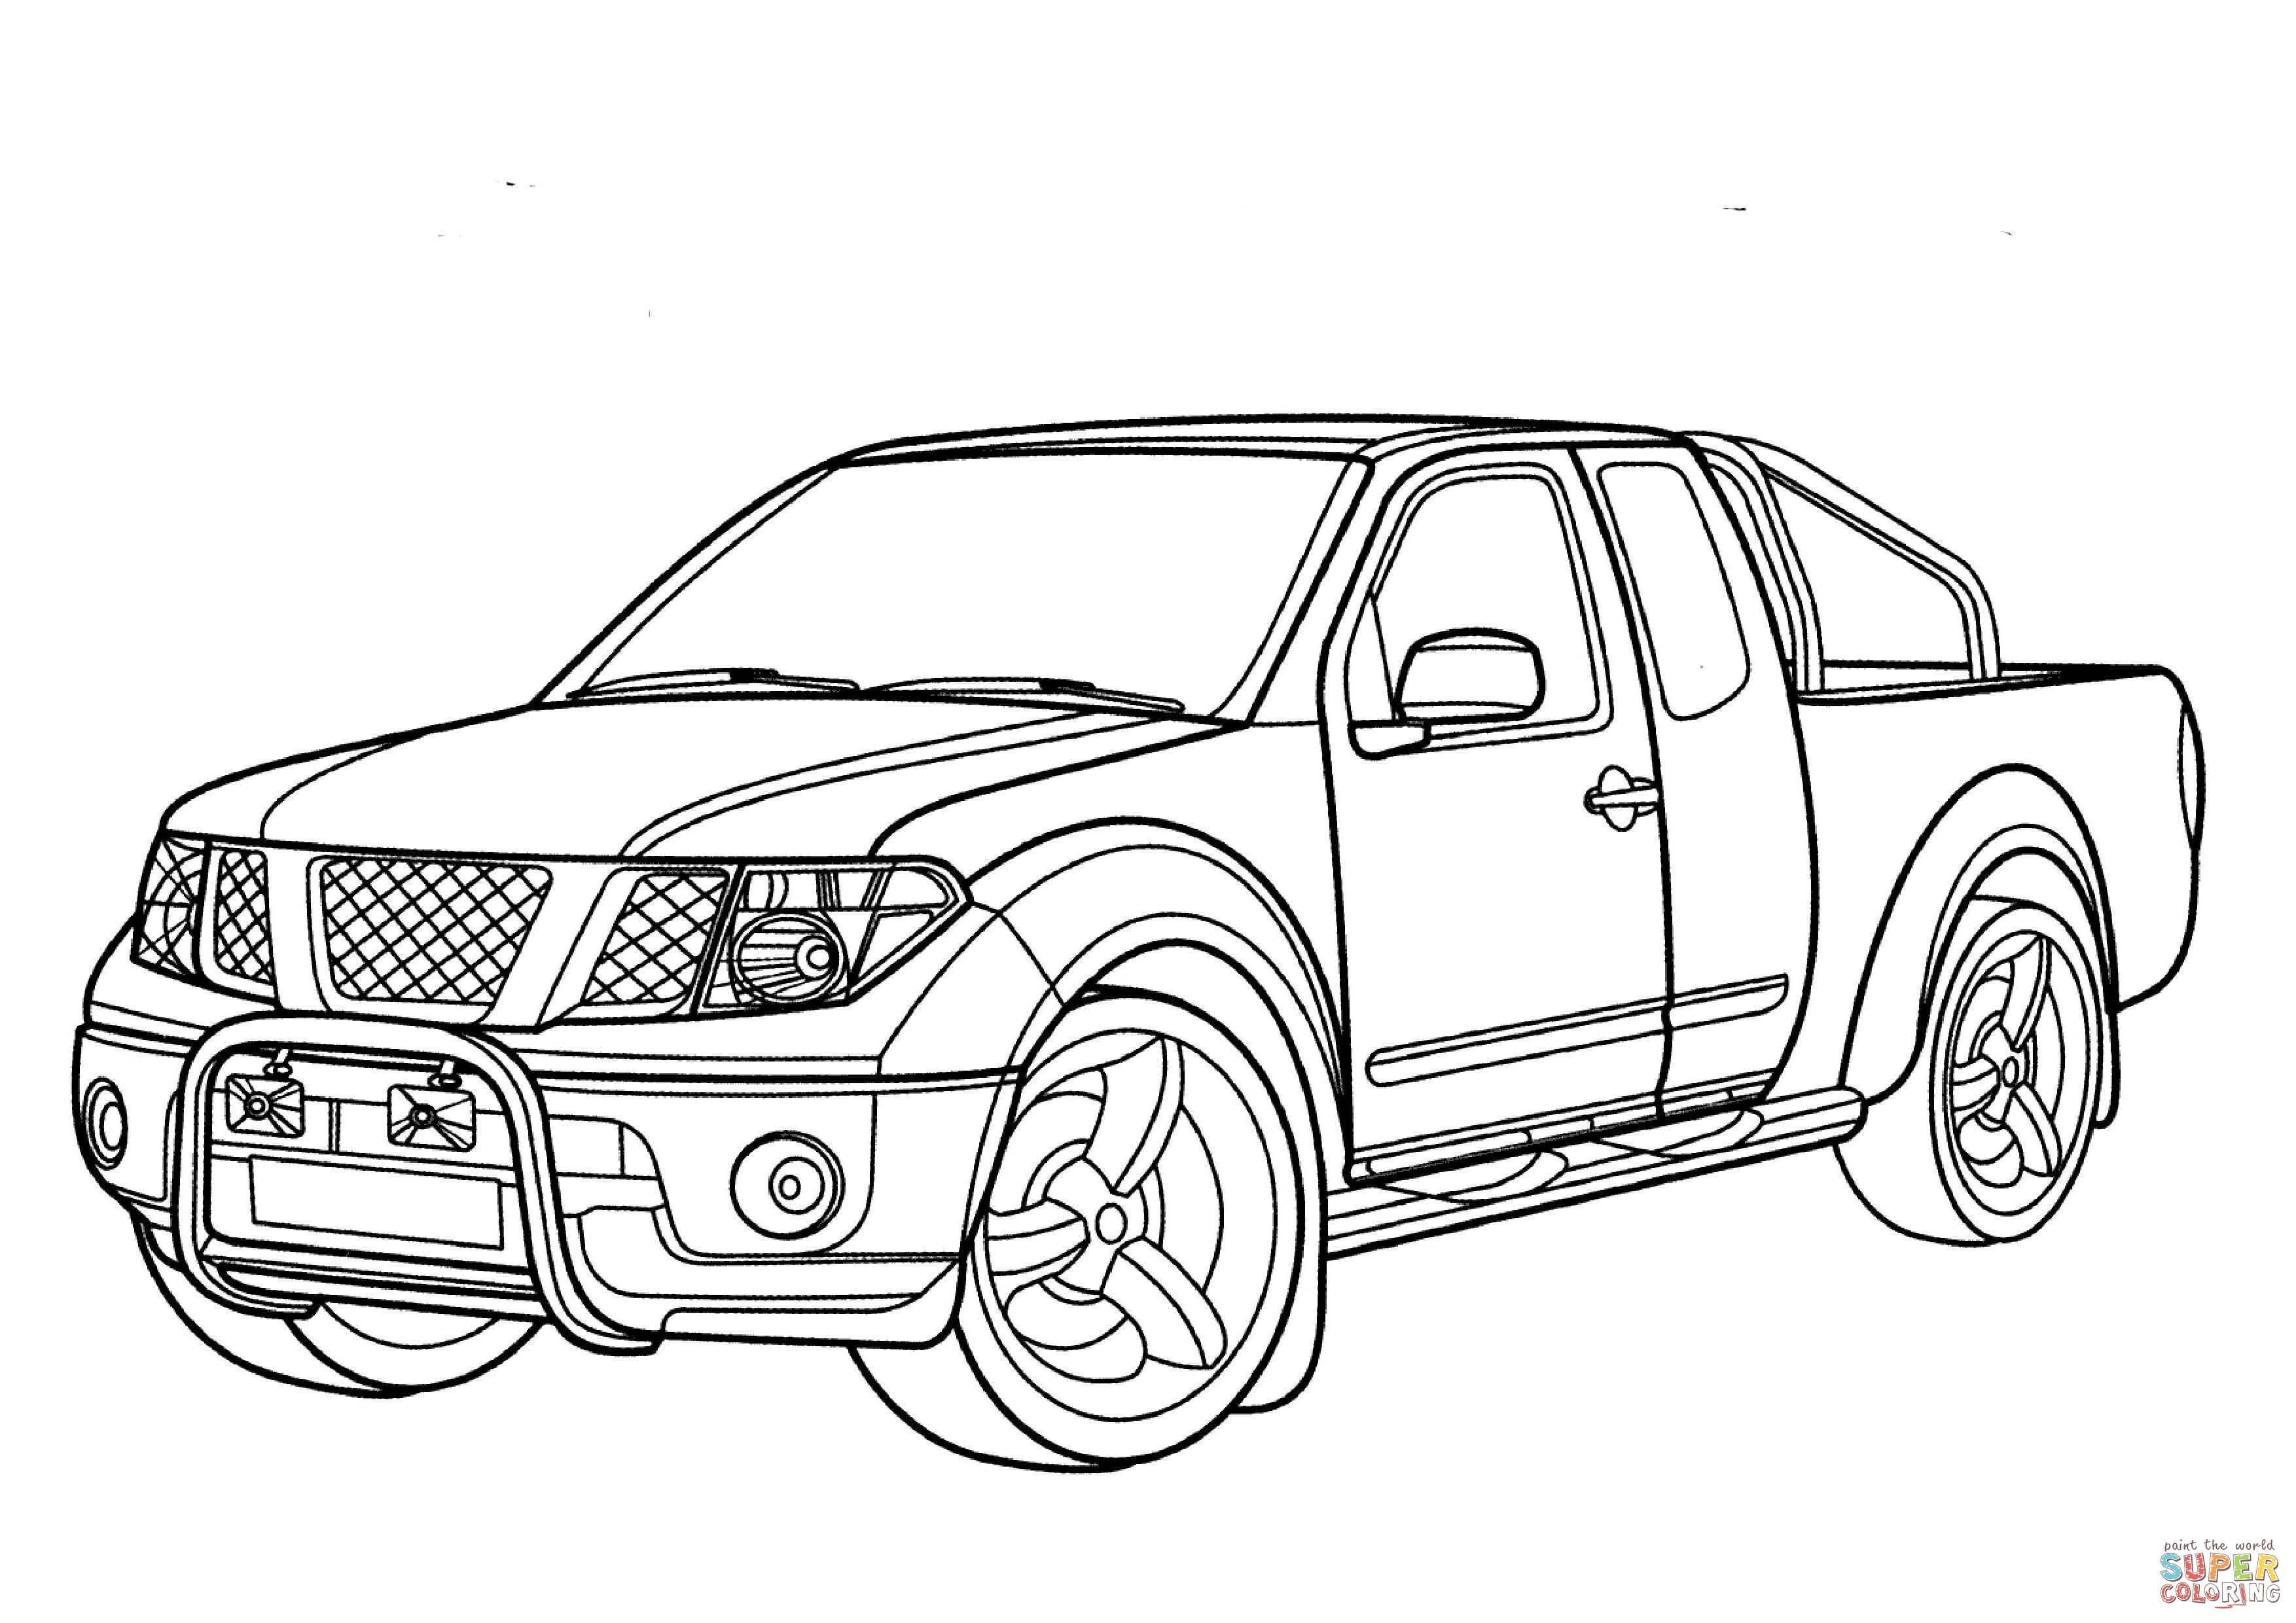 Nissan-Navara-coloring-page.jpg (10×10)  Ausmalbilder